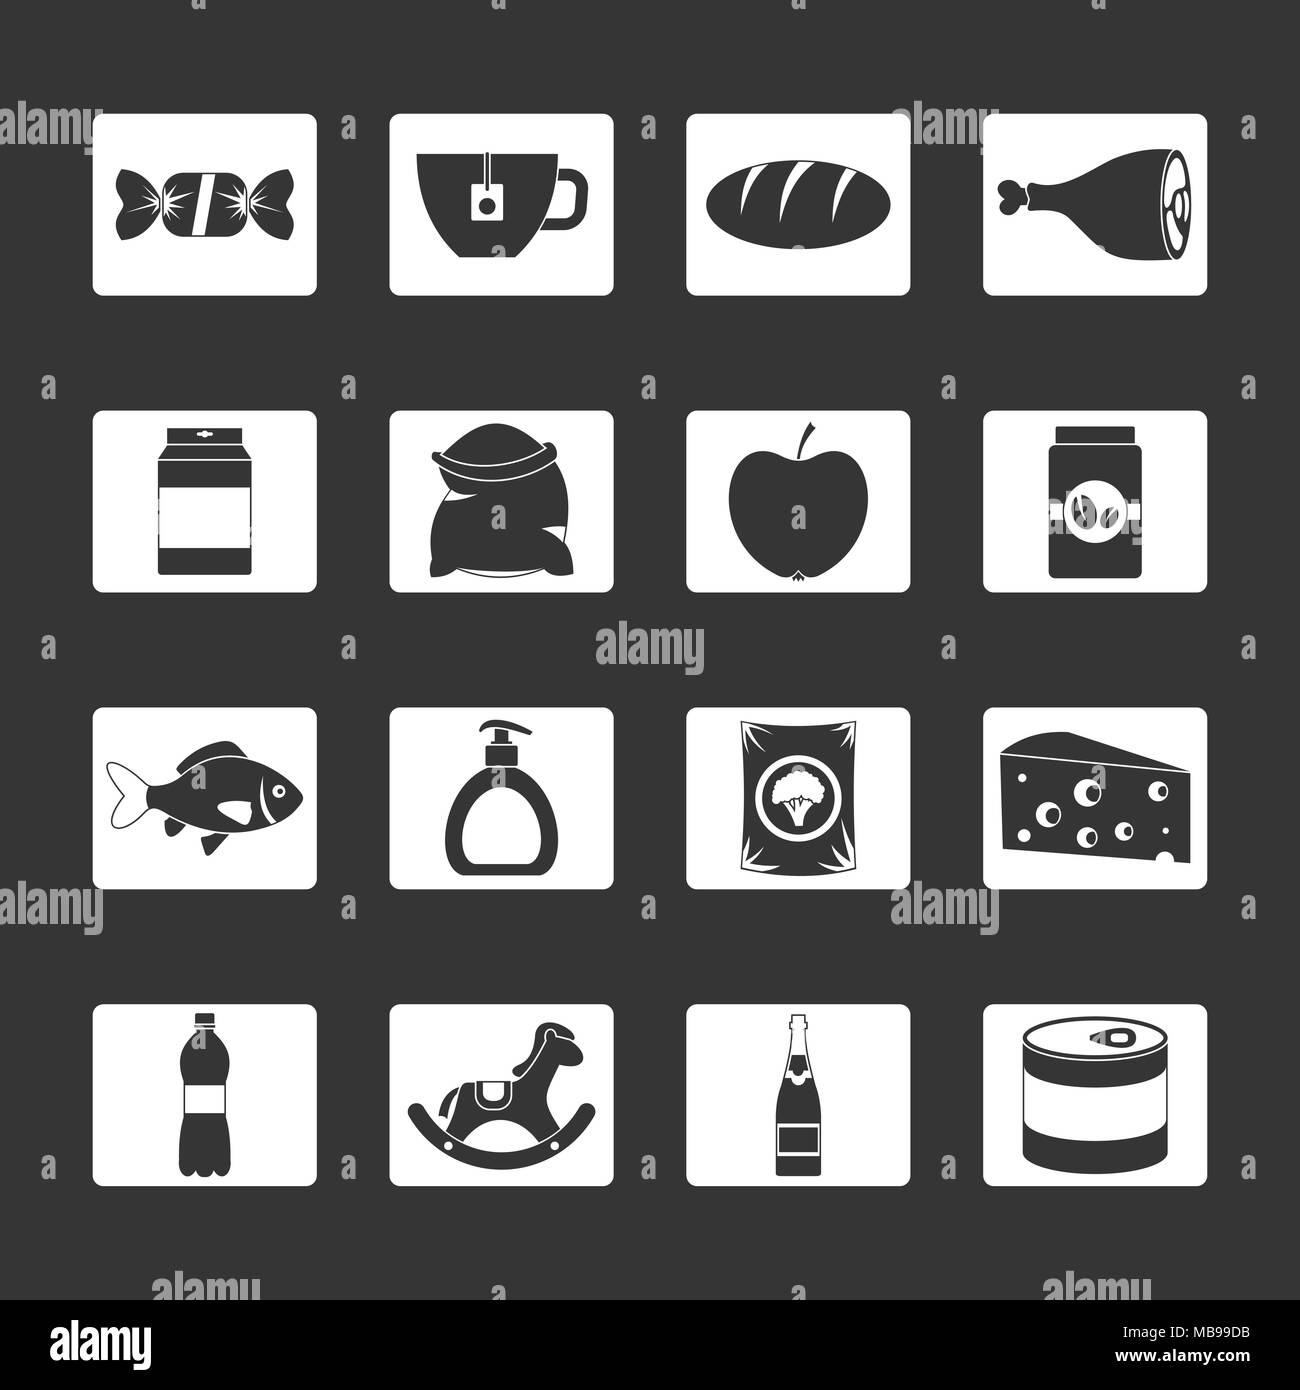 Shop navigation foods icons set grey vector - Stock Image